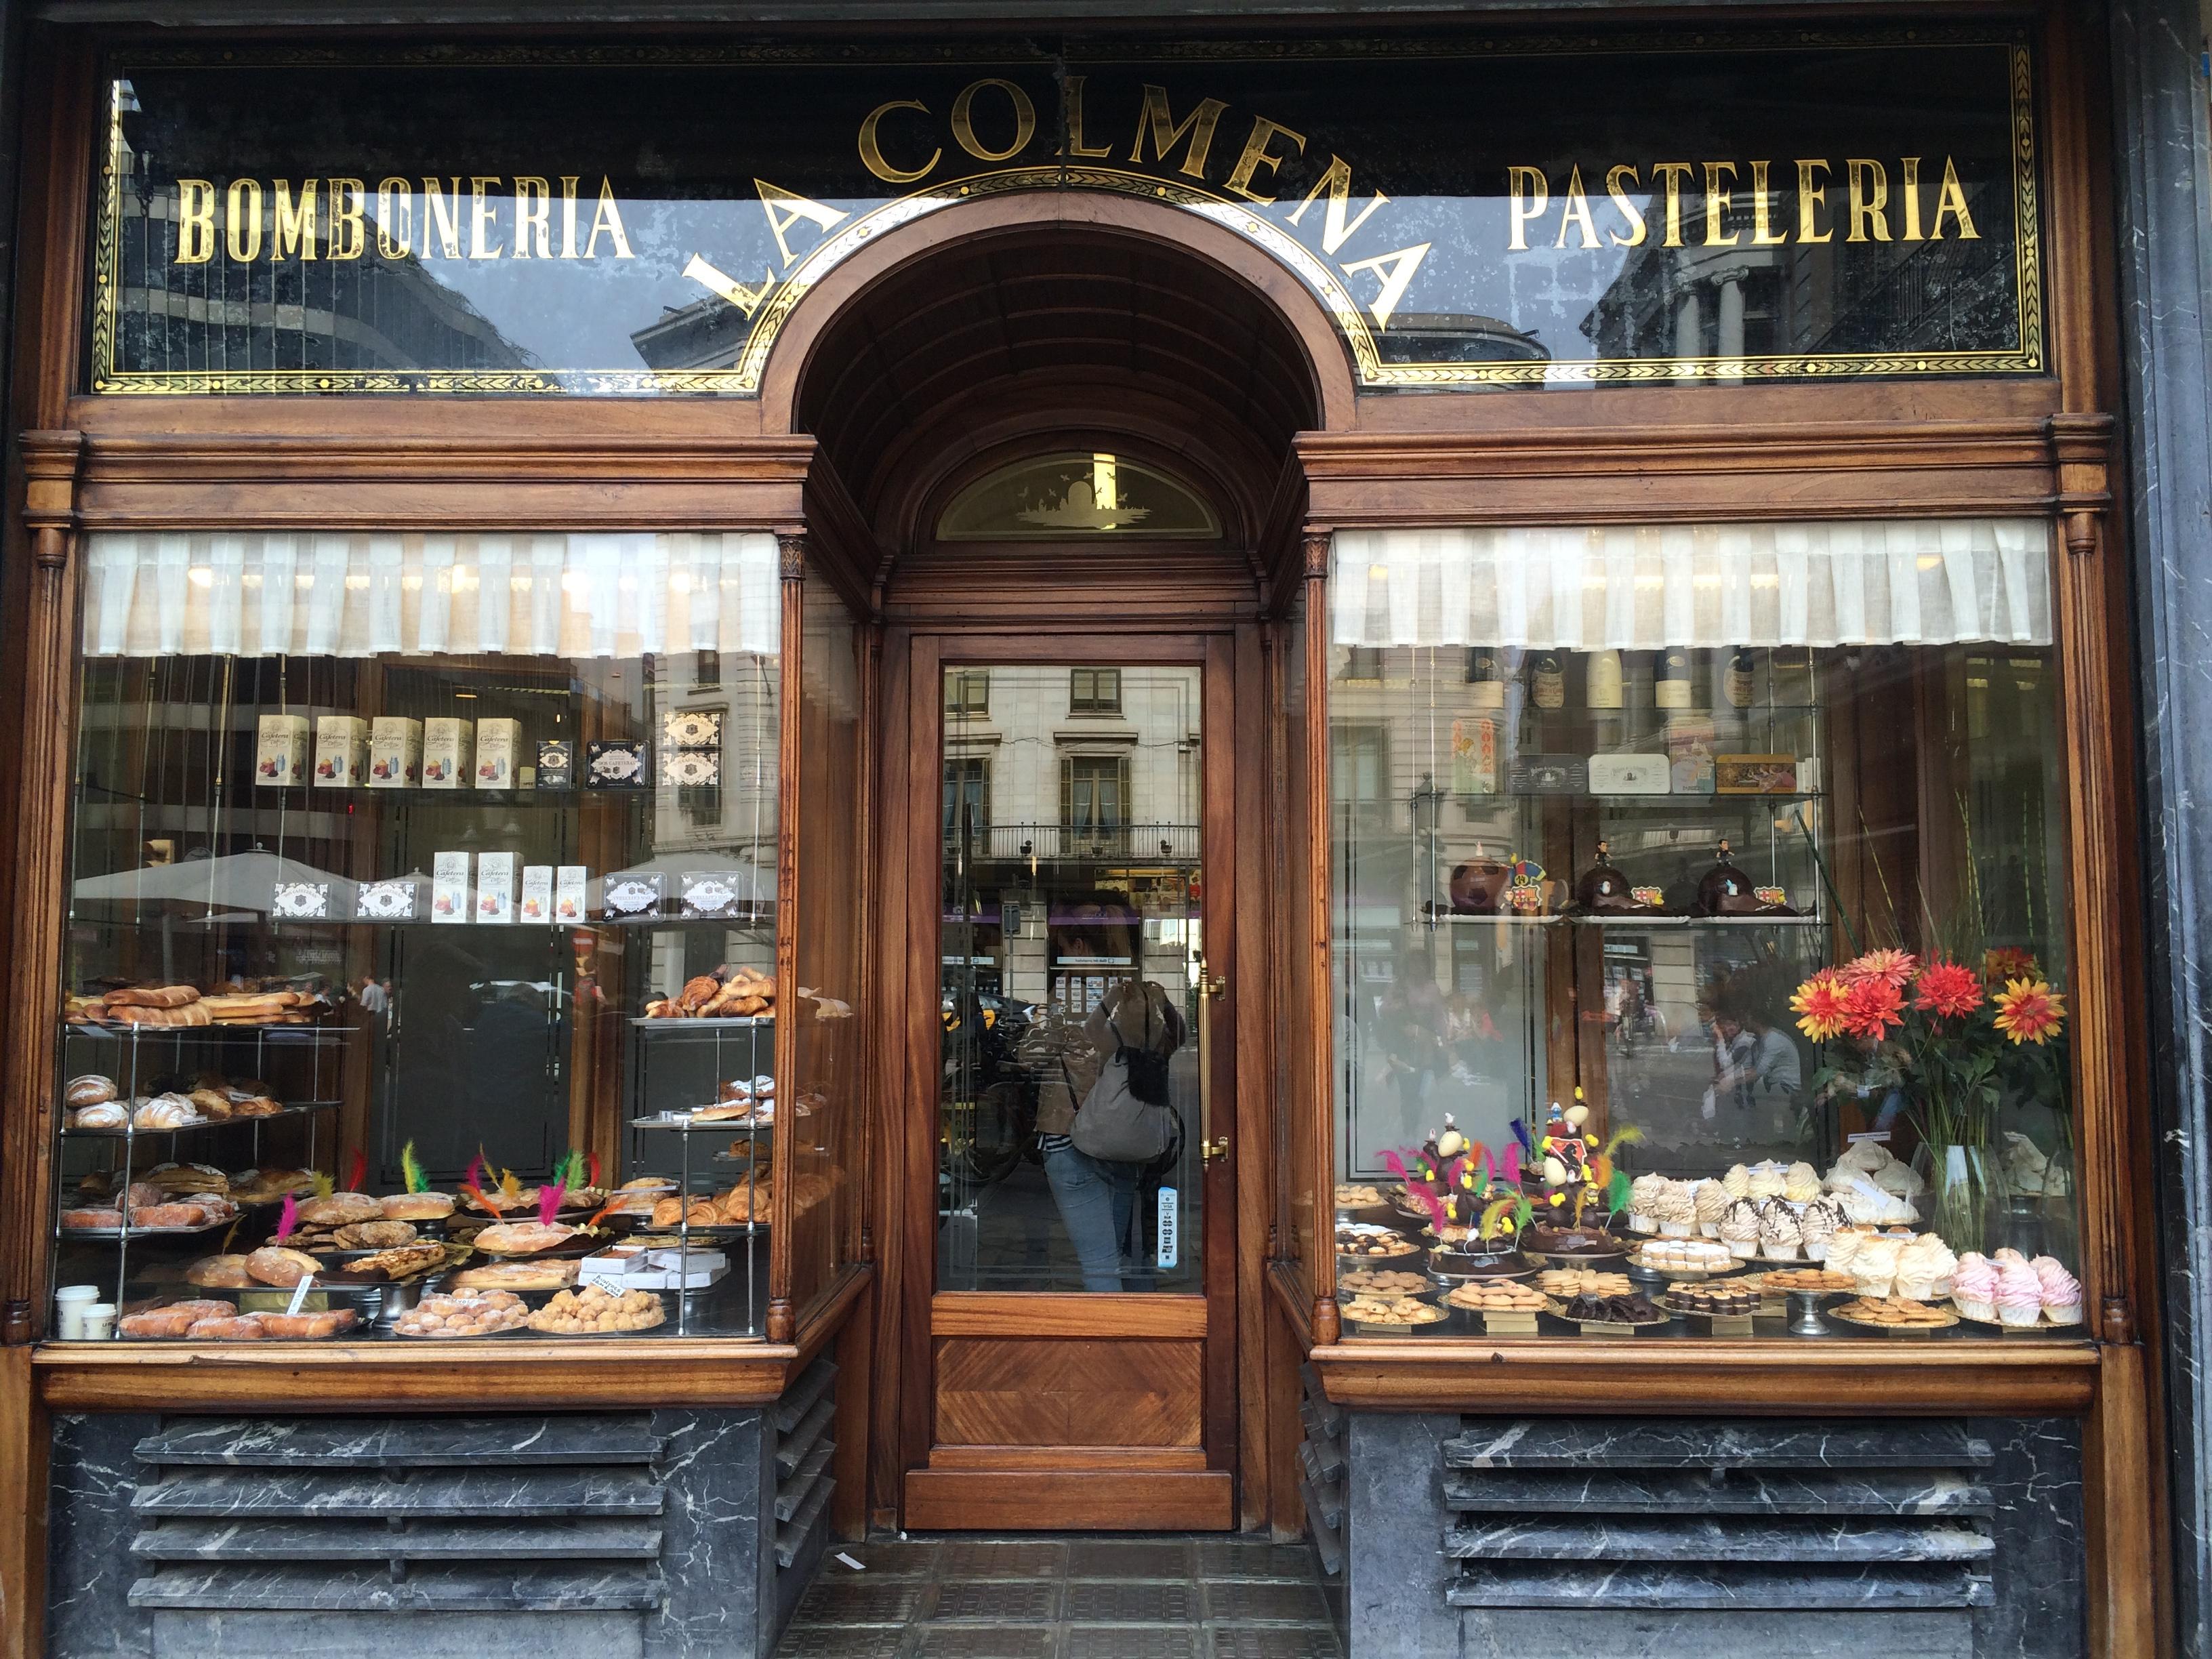 Barcelona Bomboneria La Colmena pastry cake food